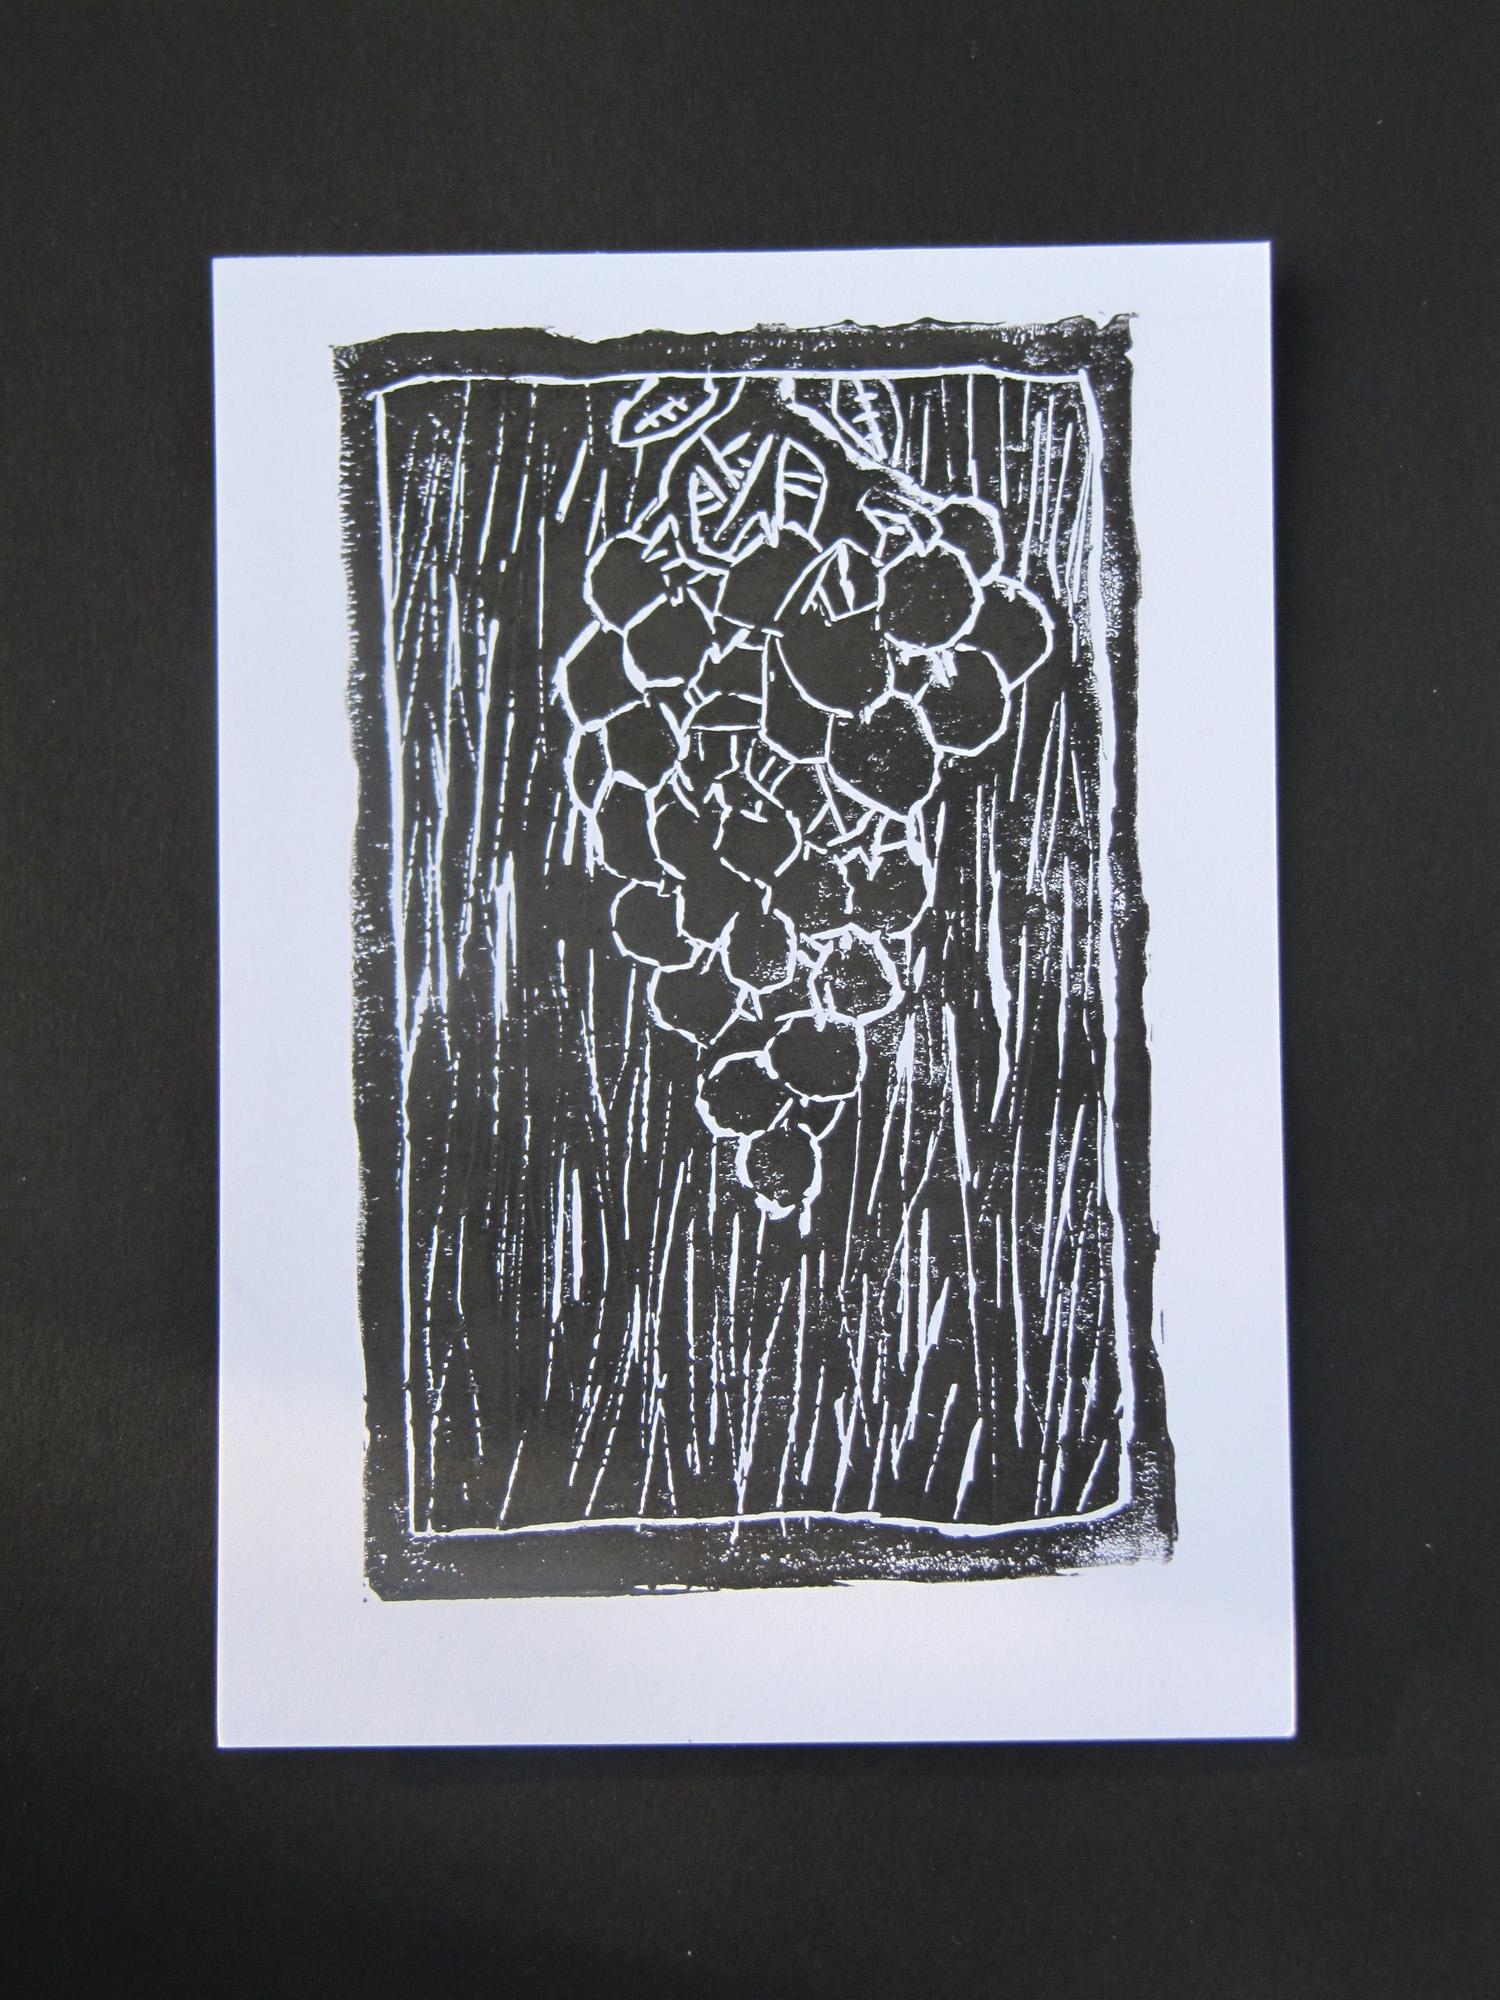 CLIP Art.2010.Lawson 043.jpg